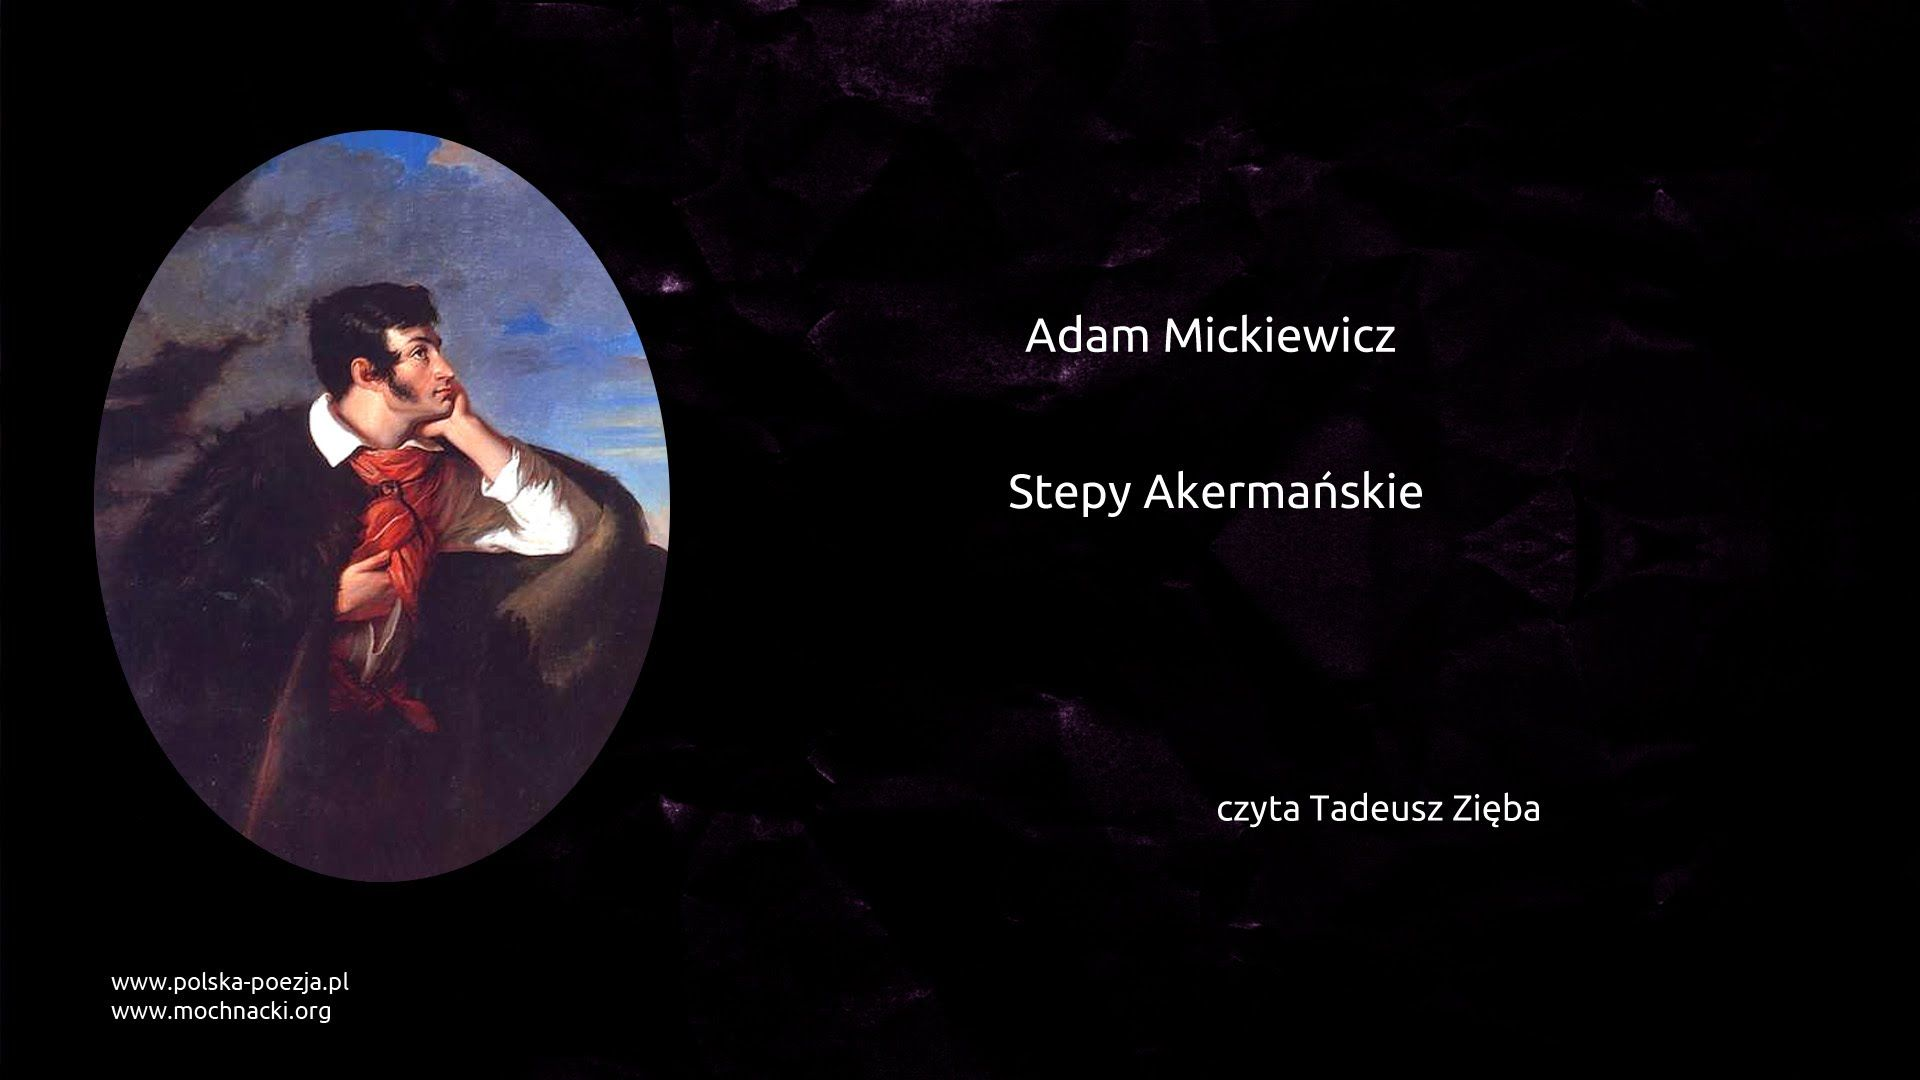 Adam Mickiewicz Stepy Akermańskie Movie Posters Artist